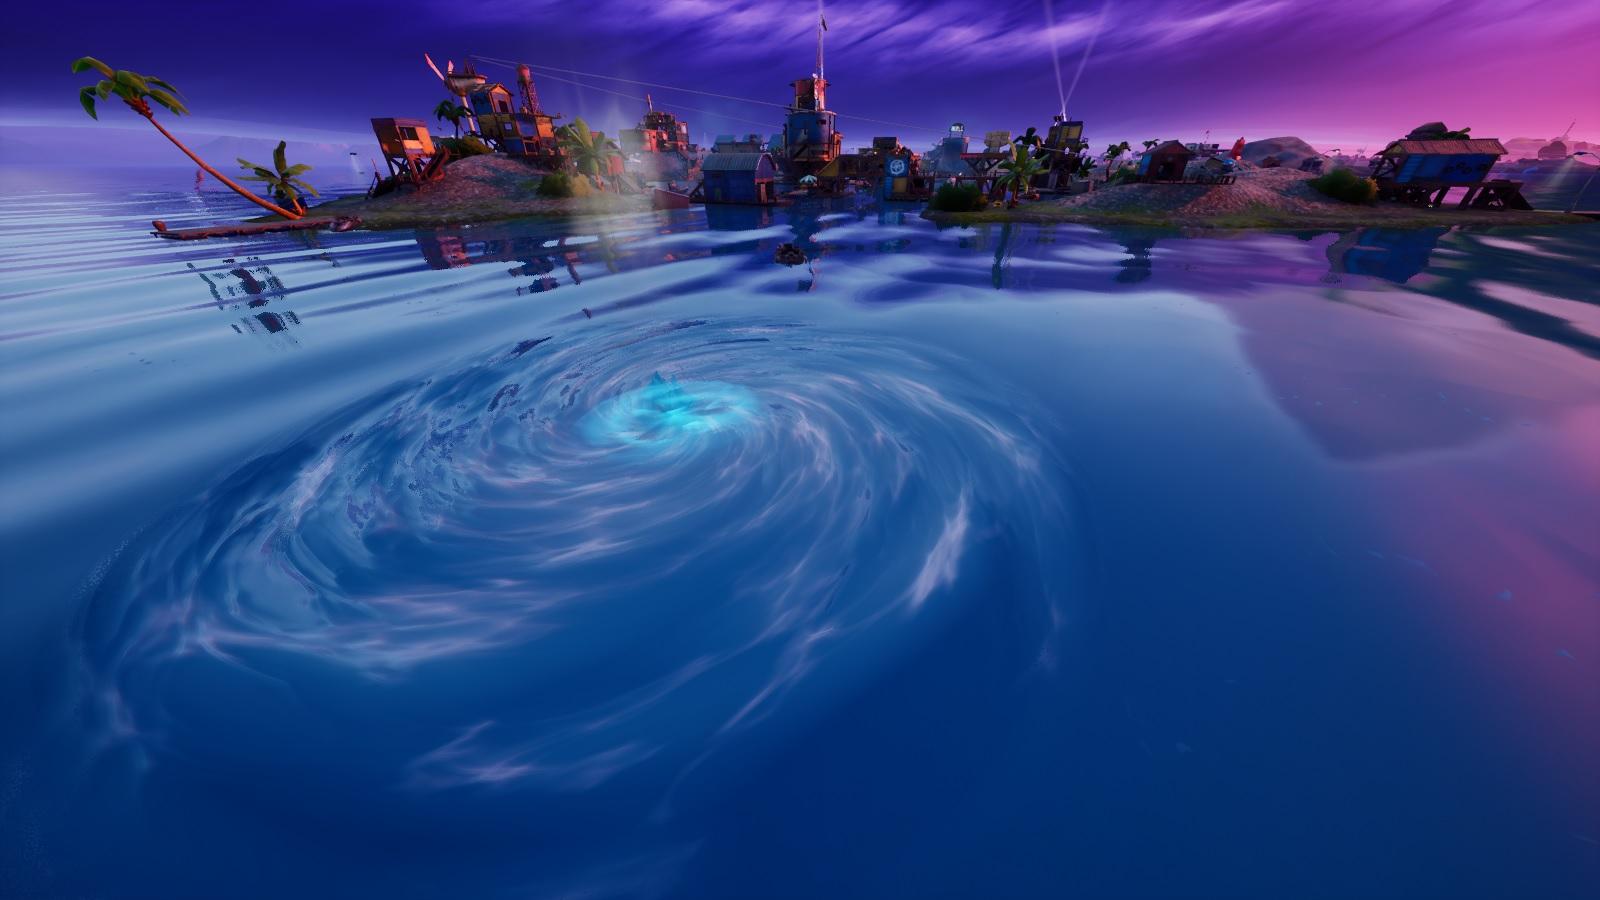 Fortnite Whirlpool at Fortilla POI